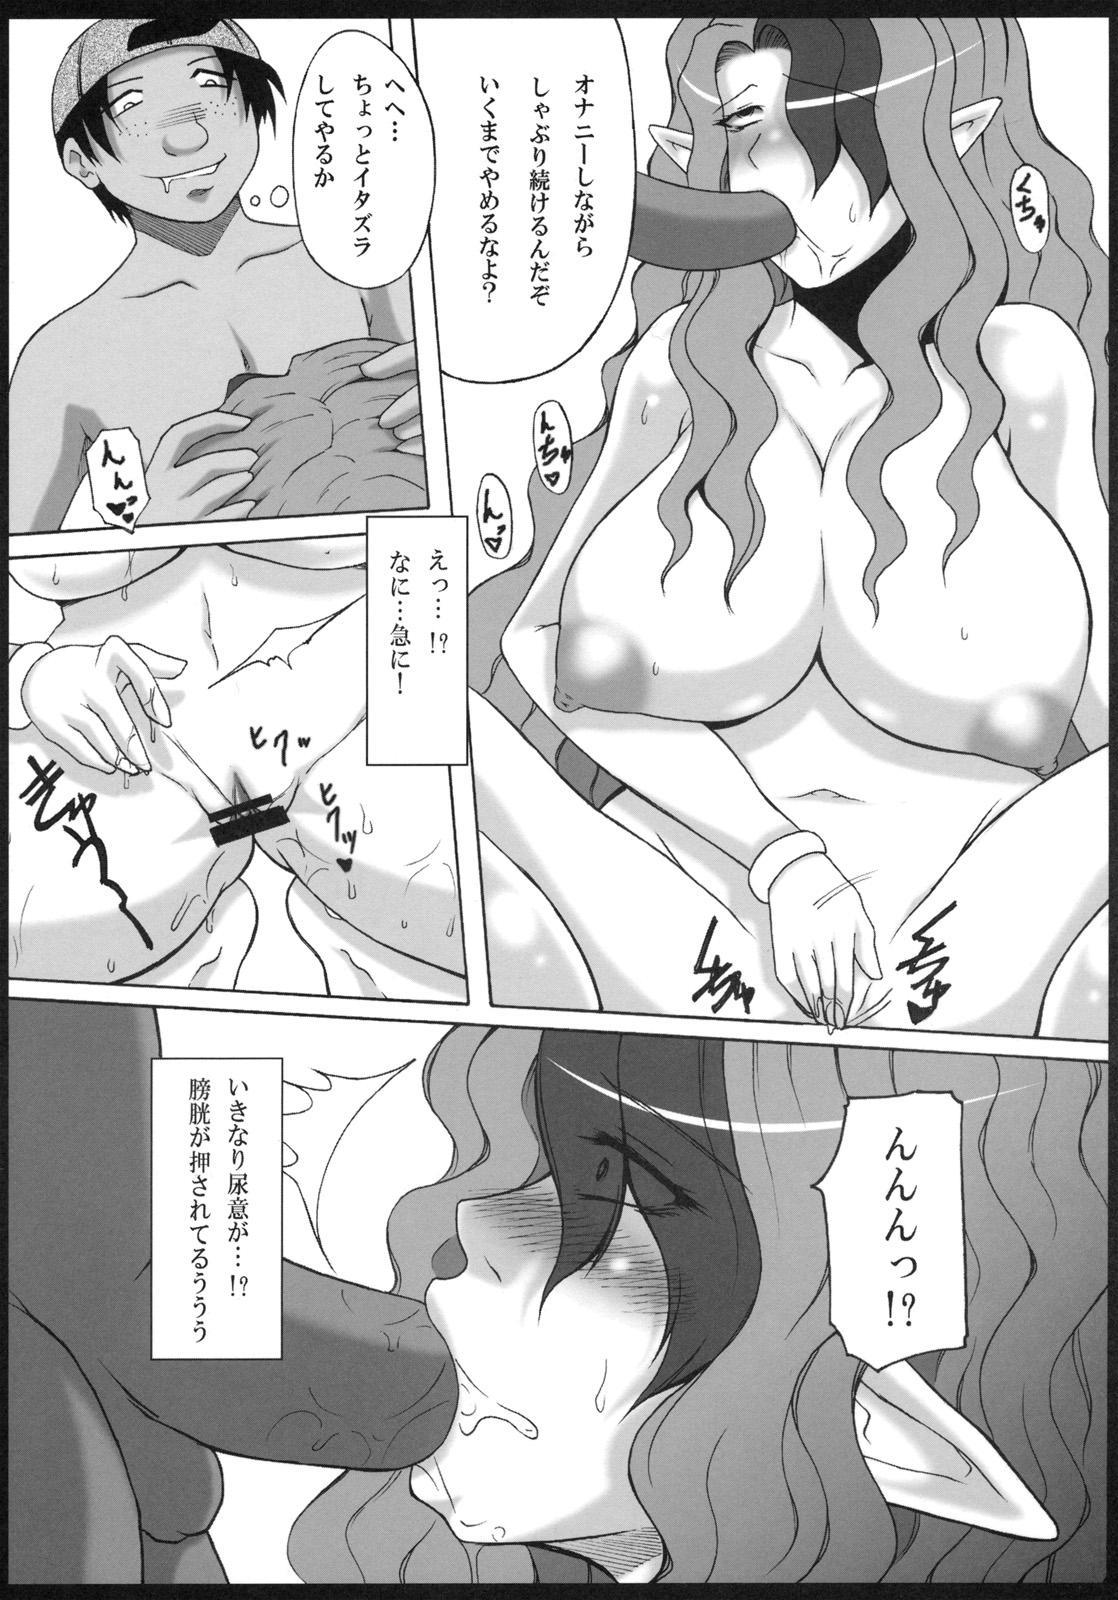 Misery no Choukyoukan 10